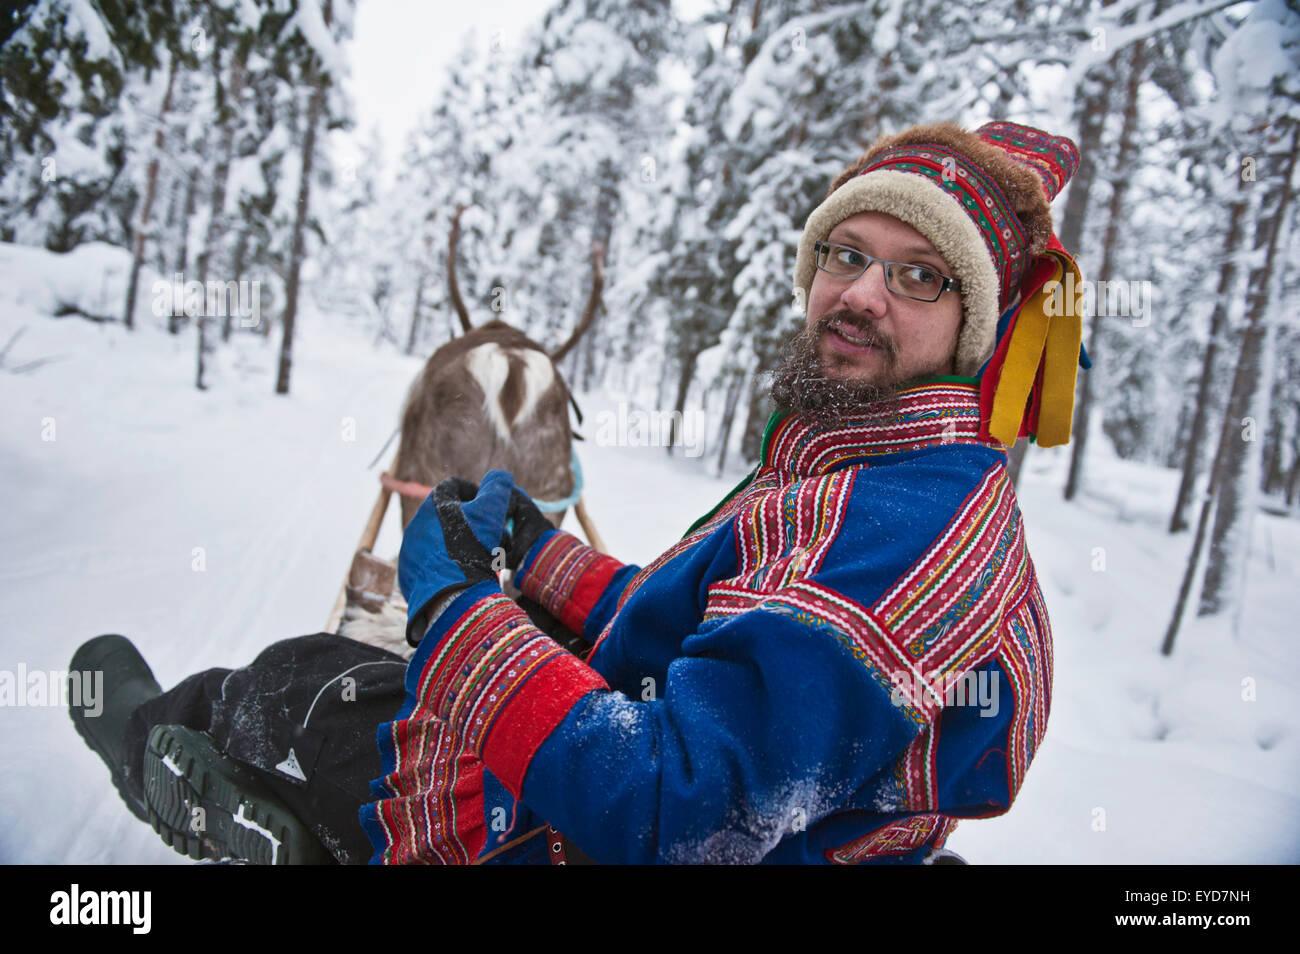 1bca347b3ee A Herder With Reindeer Wearing The Traditional Sami Clothing At  Ounaskievari Reindeer Farm